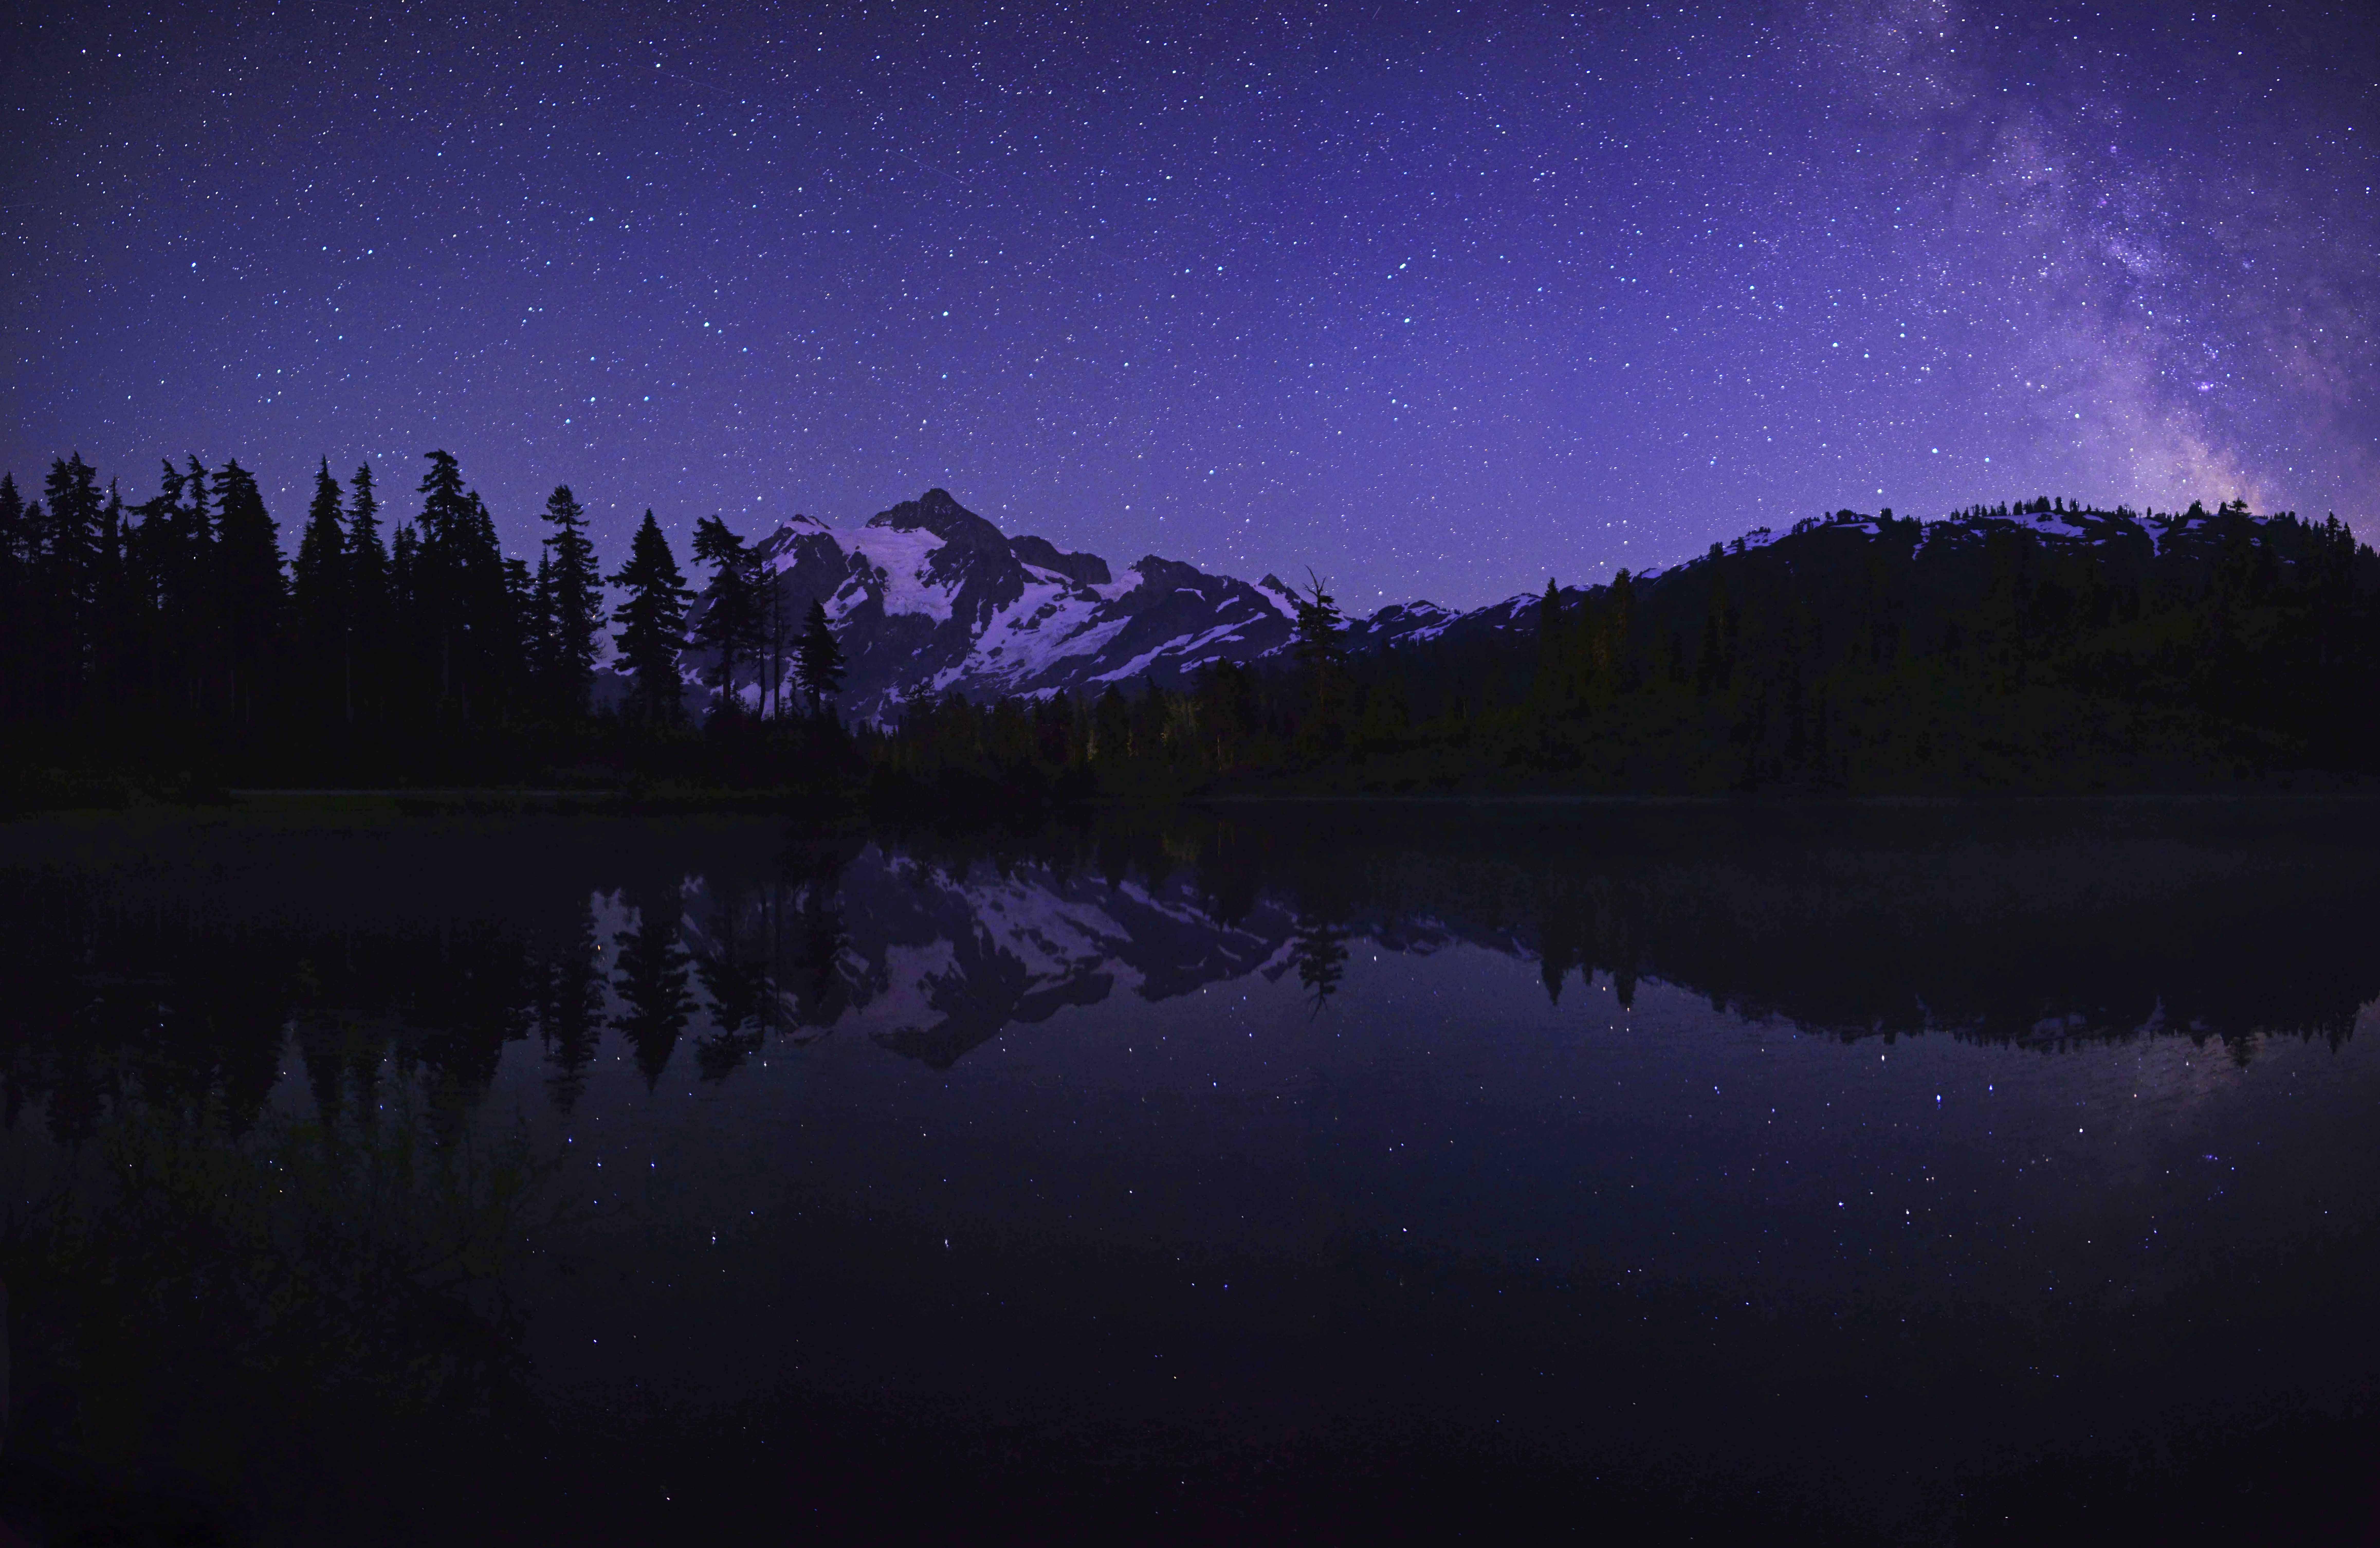 Road Trip Planner >> Evening Explorations - North Cascades National Park (U.S ...